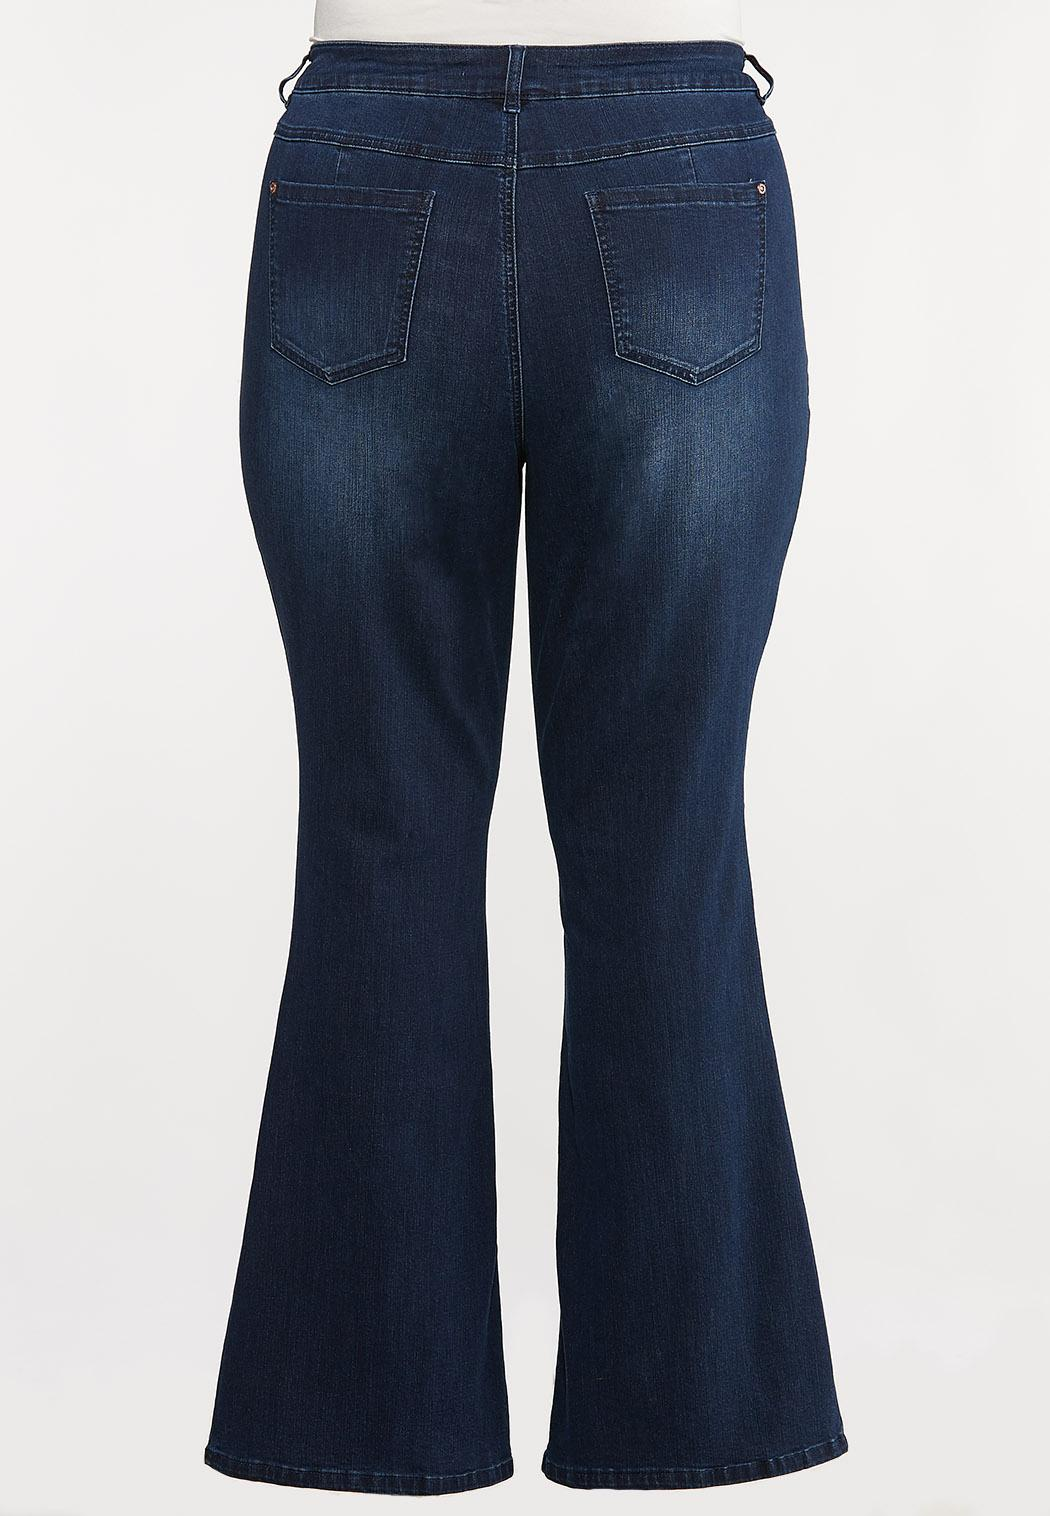 Plus Size Dark Wash Flare Jeans (Item #44096537)